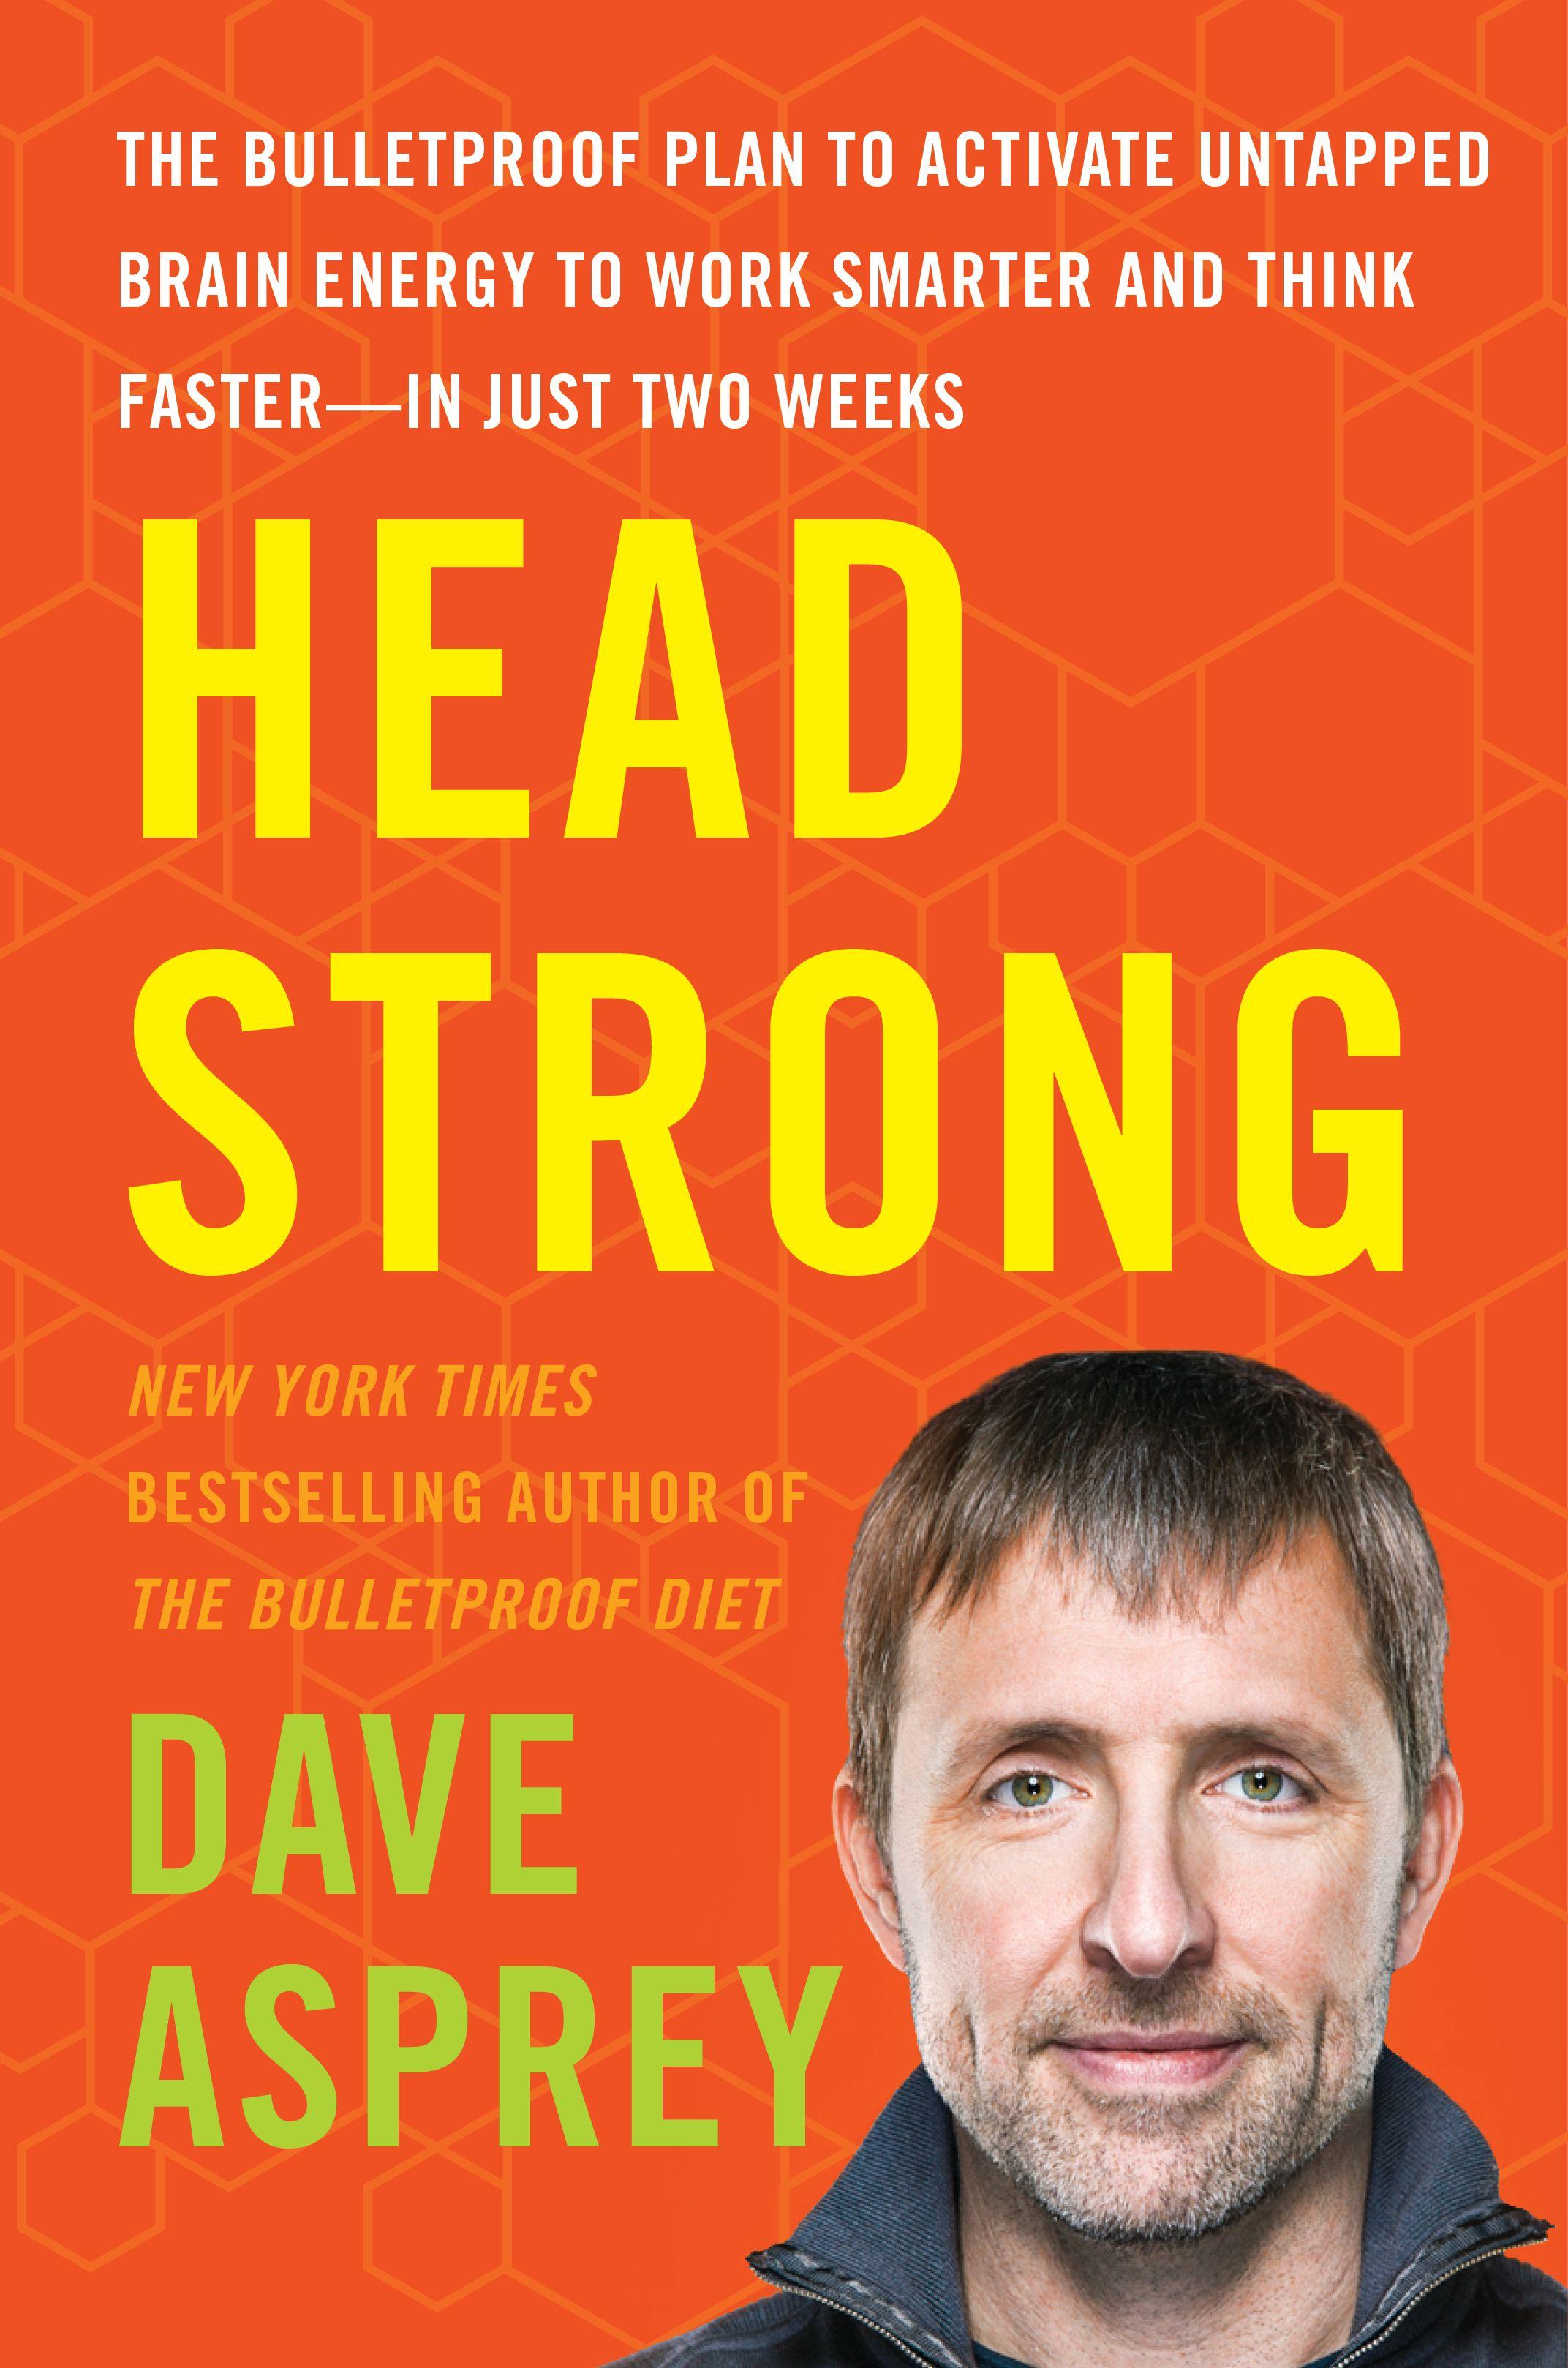 Download Ebook Head Strong By Dave Asprey In Pdf Epub Nook Mobi Djvu Kindle  Format